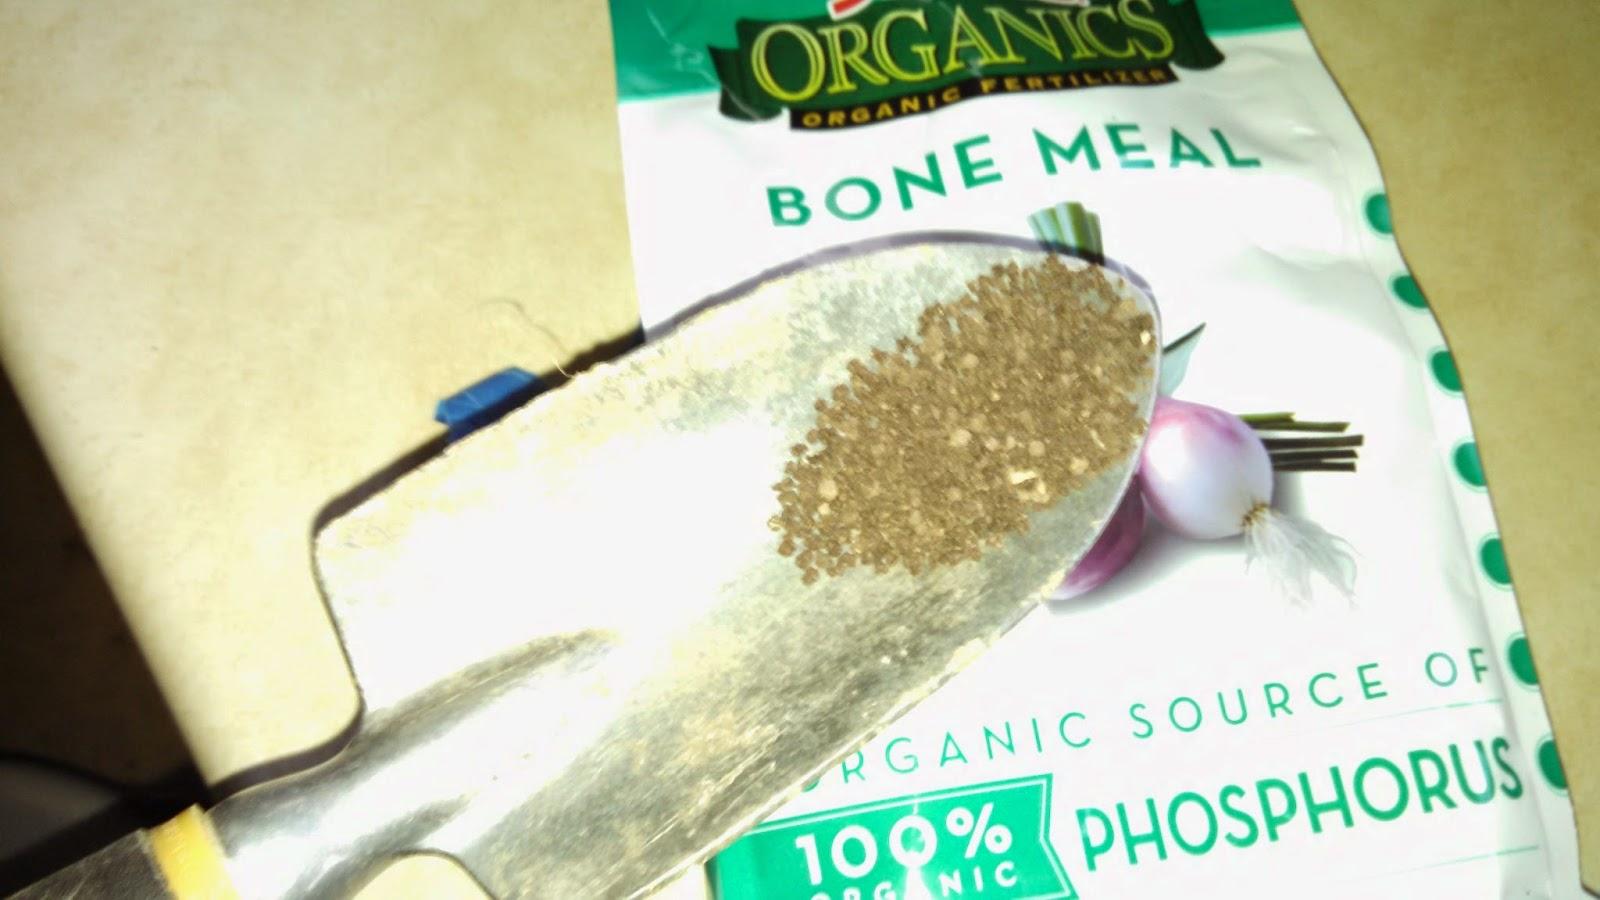 Organic Bone Meal- Adds Phosphorus